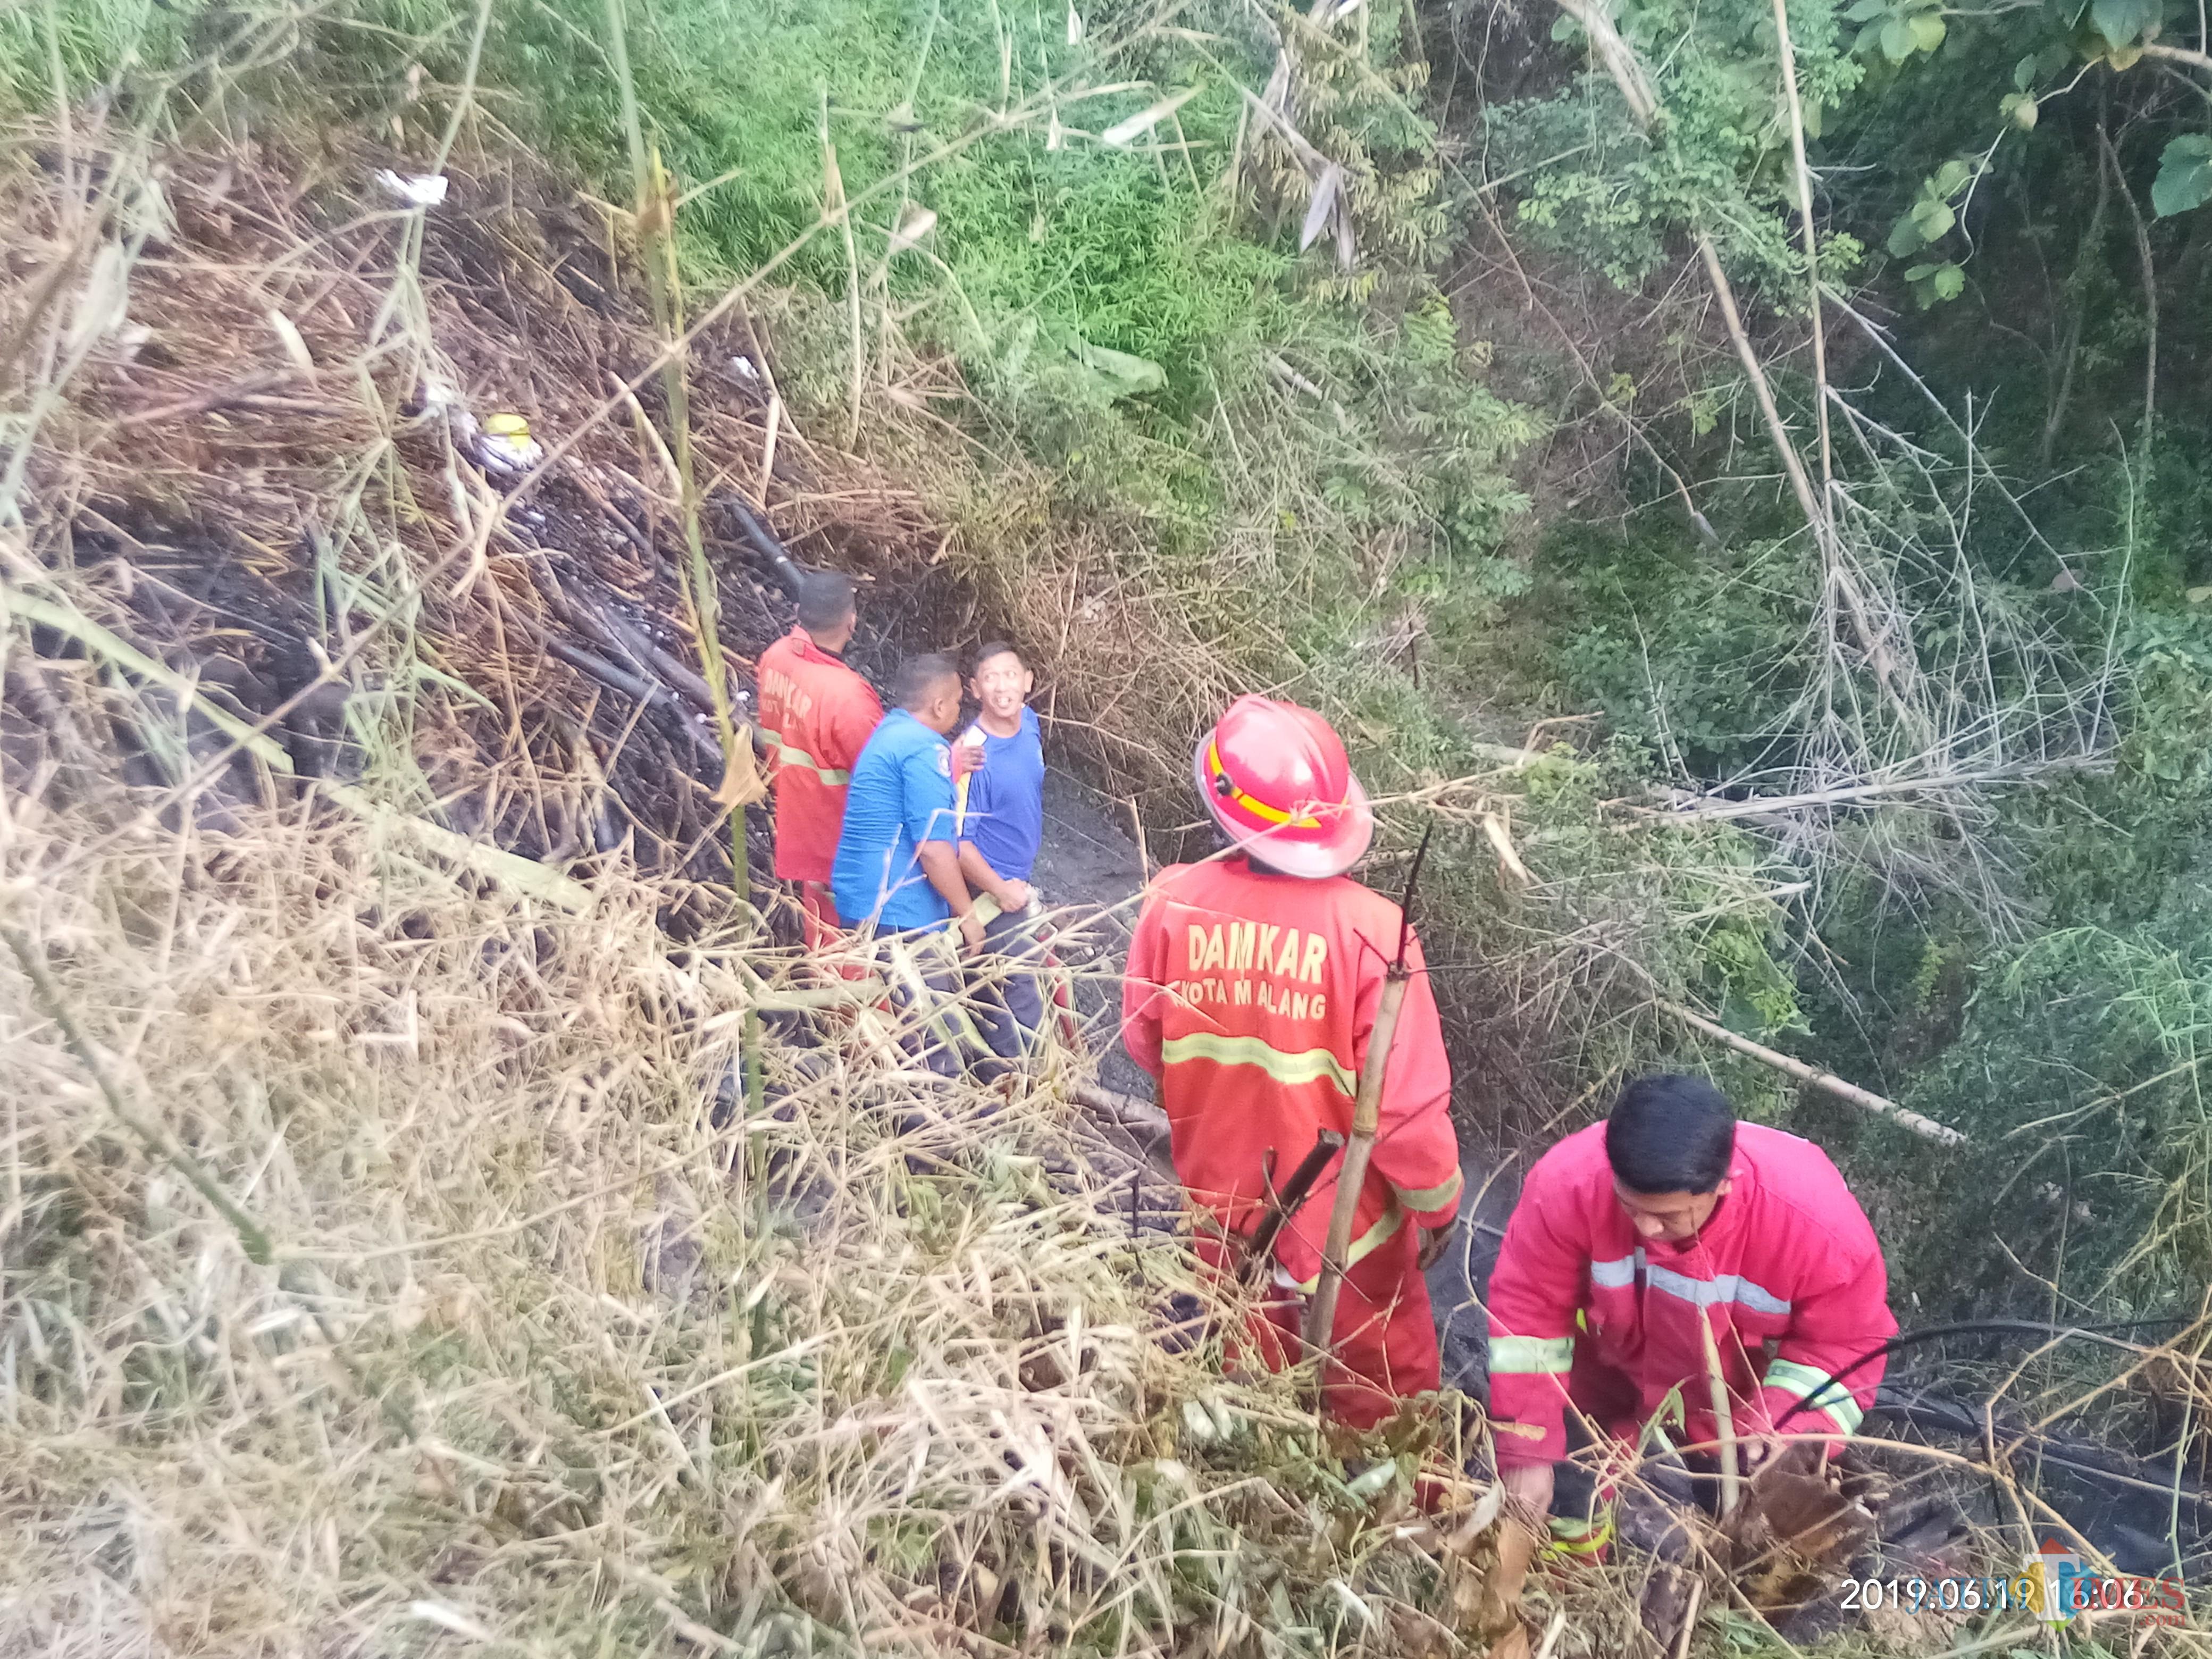 Petugas PMK yang tengah berupaya memadamkan sisa bara api agar tidak kembali memicu kebakaran( Anggara Sudiongko/MalangTIMES)